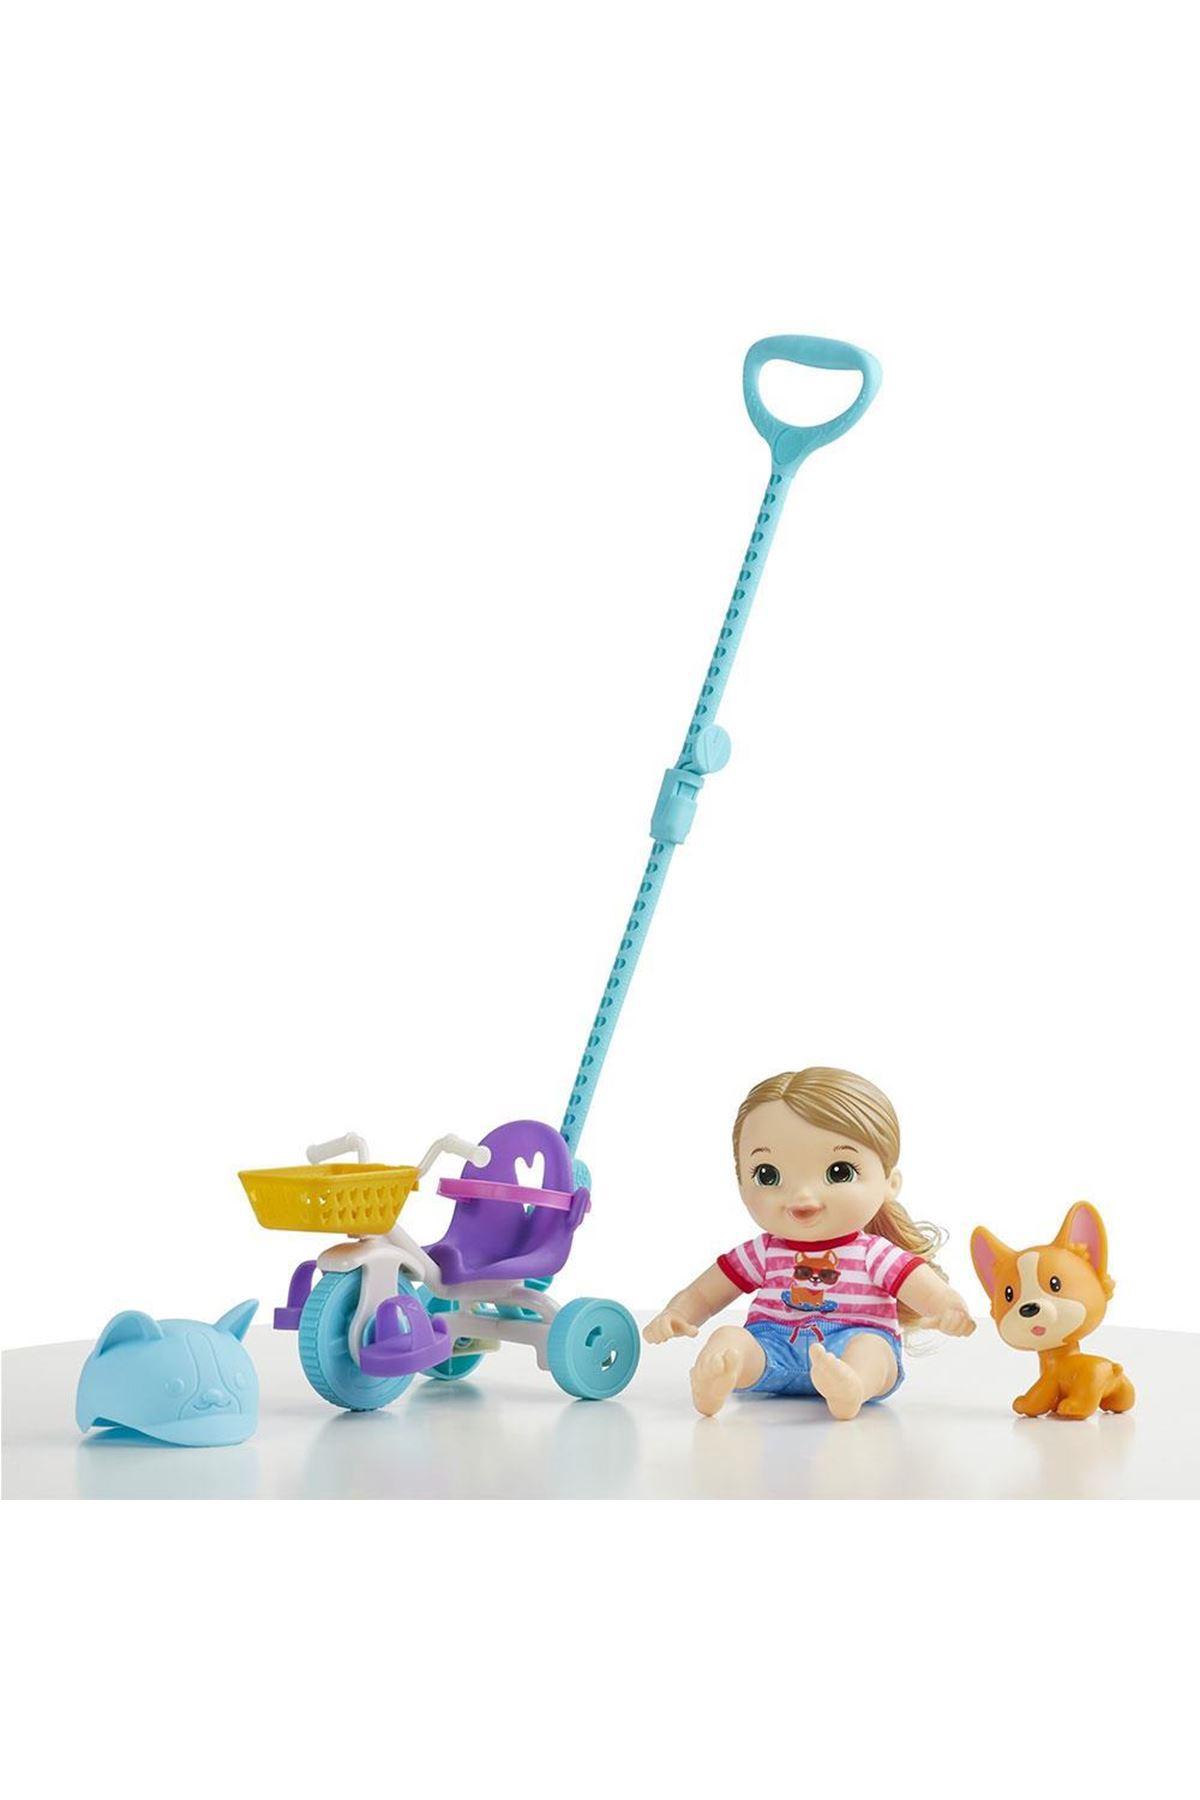 Baby Alive Minik Bebeğim ve Üç Tekerli Bisiklet